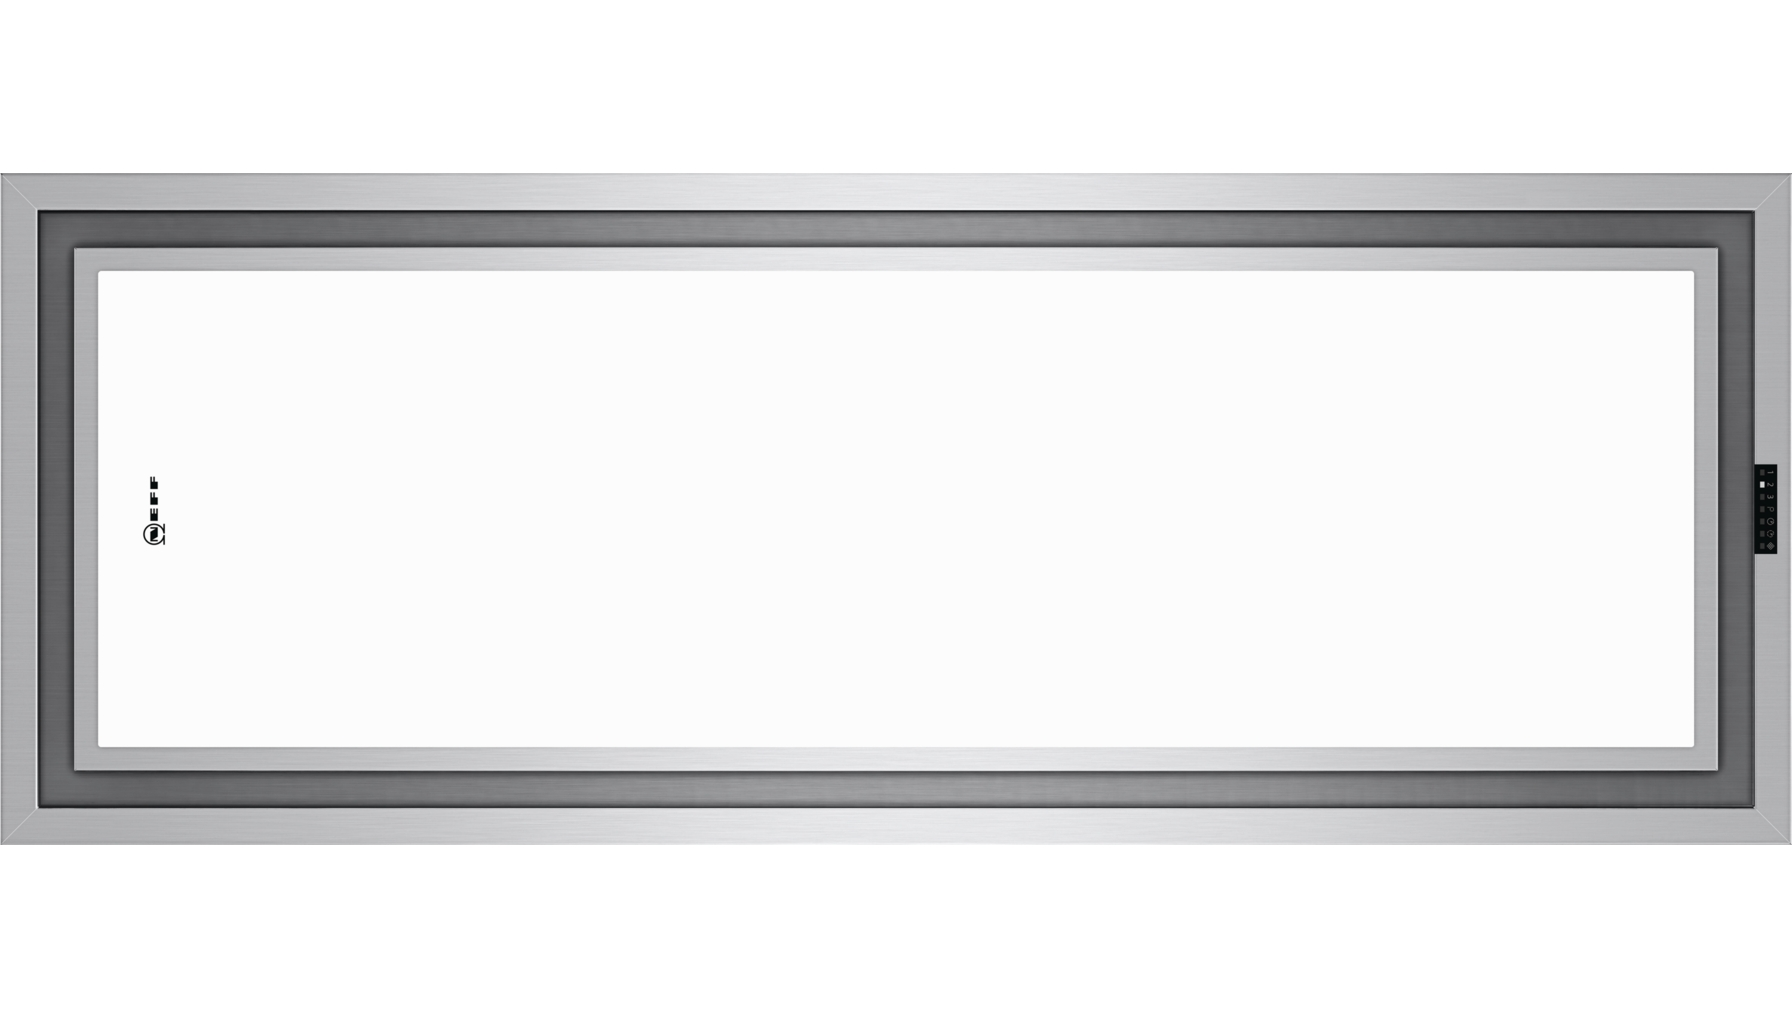 neff produkte dunstabzugshauben deckenl fter i92cm67n0. Black Bedroom Furniture Sets. Home Design Ideas